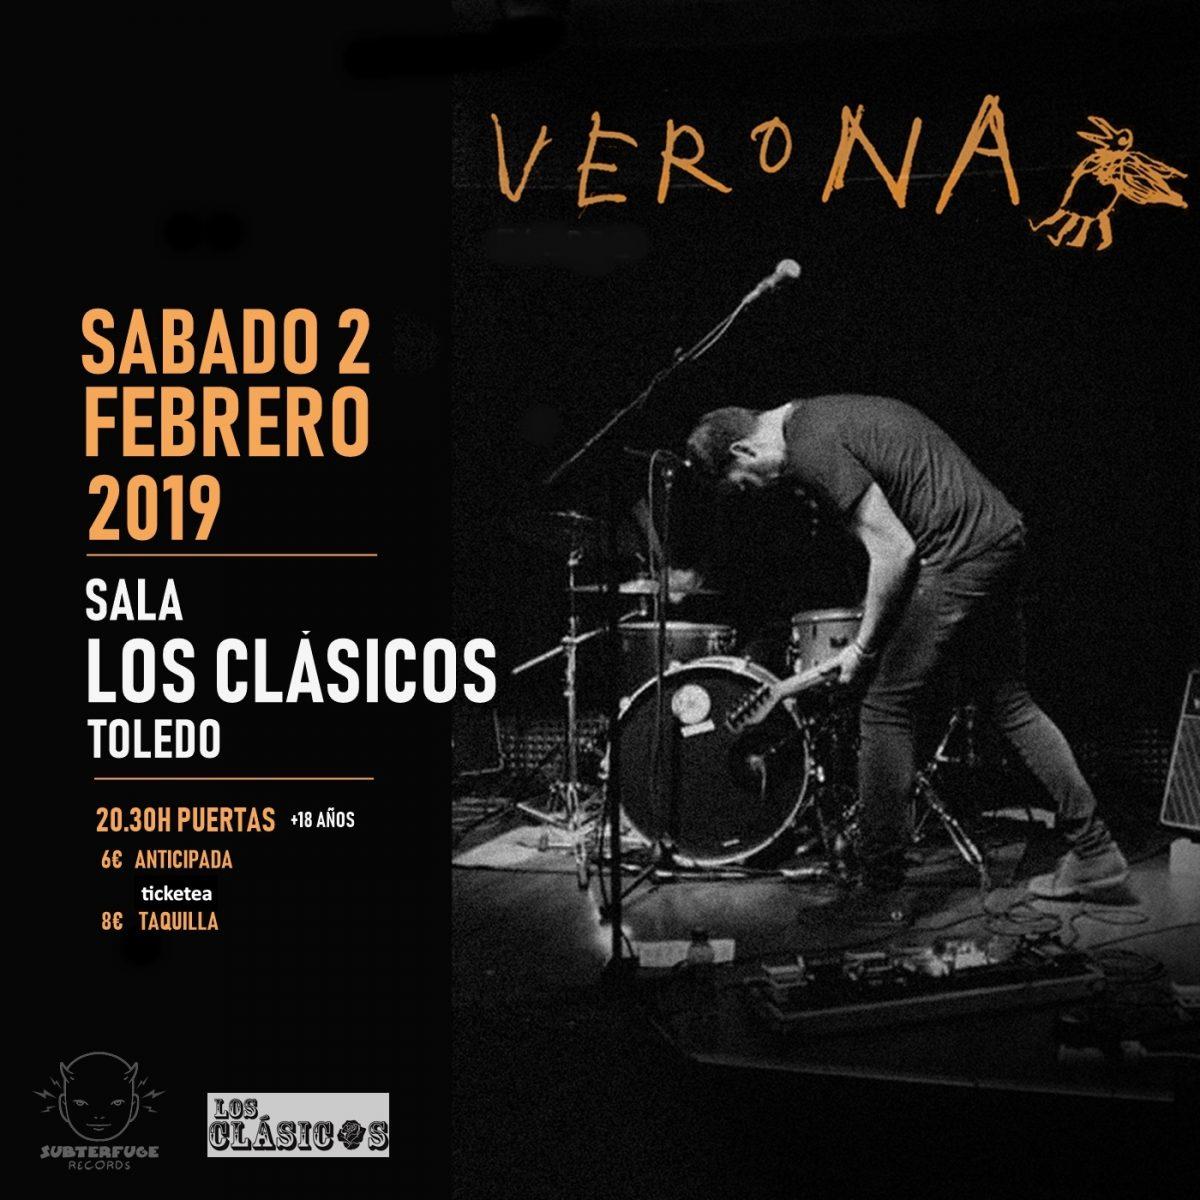 http://www.toledo.es/wp-content/uploads/2019/01/verona-1200x1200.jpg. VERONA + MUNTZ